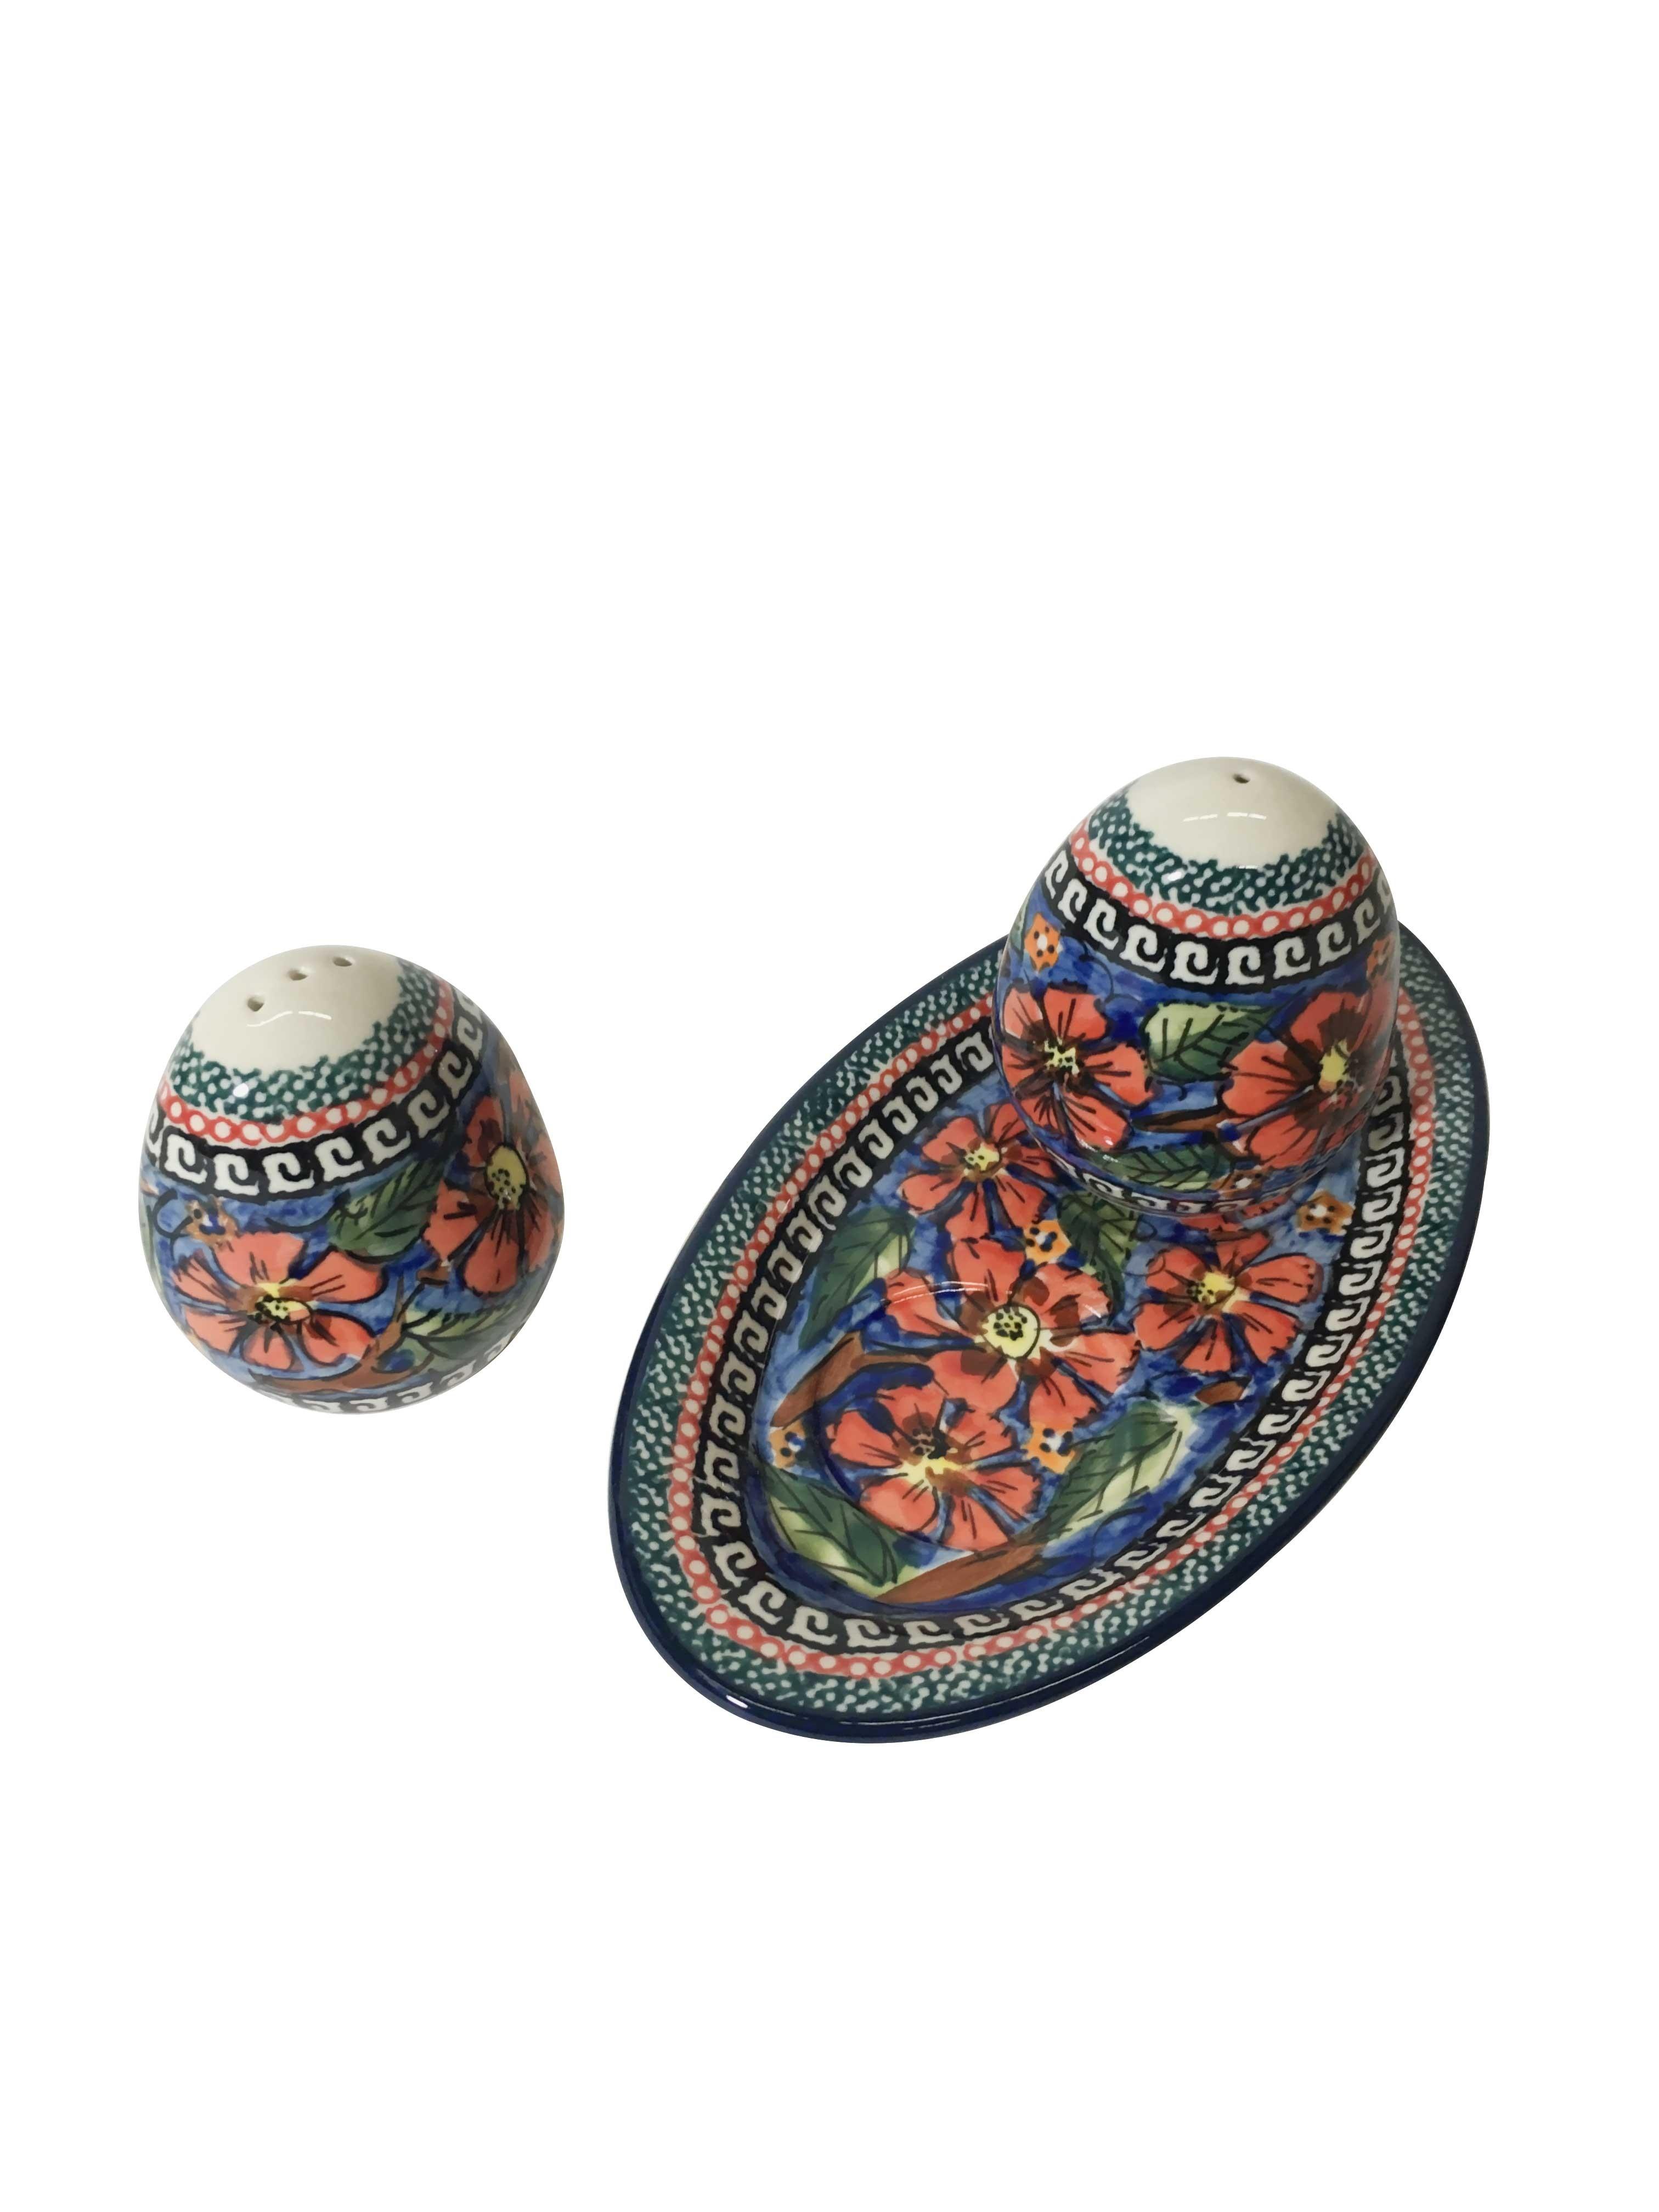 Pottery Avenue Cherished Friends 3pc Stoneware Salt and Pepper Trio Set